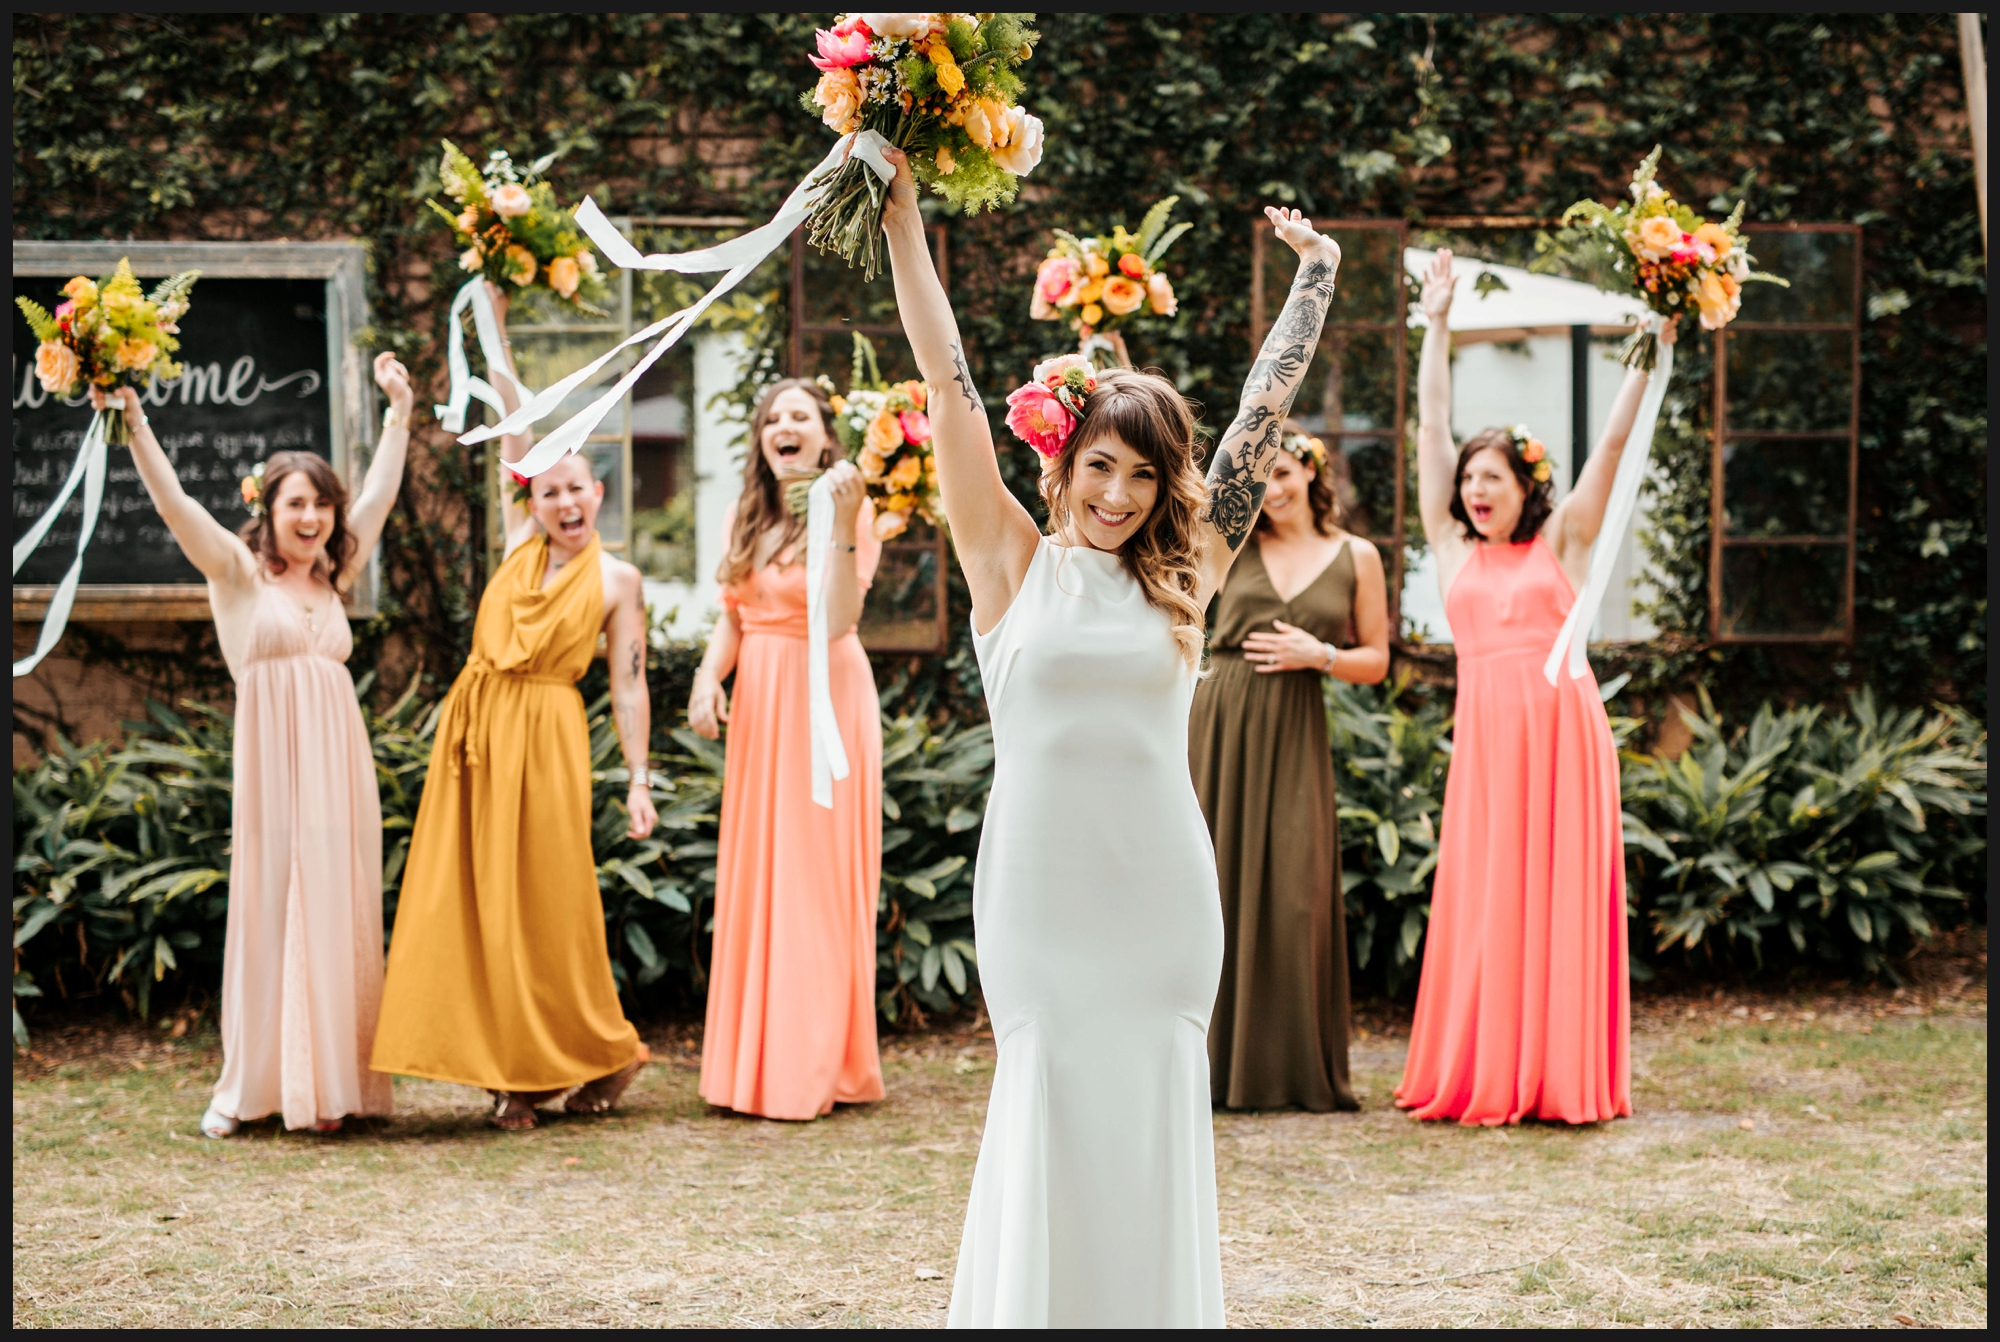 Orlando-Wedding-Photographer-destination-wedding-photographer-florida-wedding-photographer-bohemian-wedding-photographer_1983.jpg